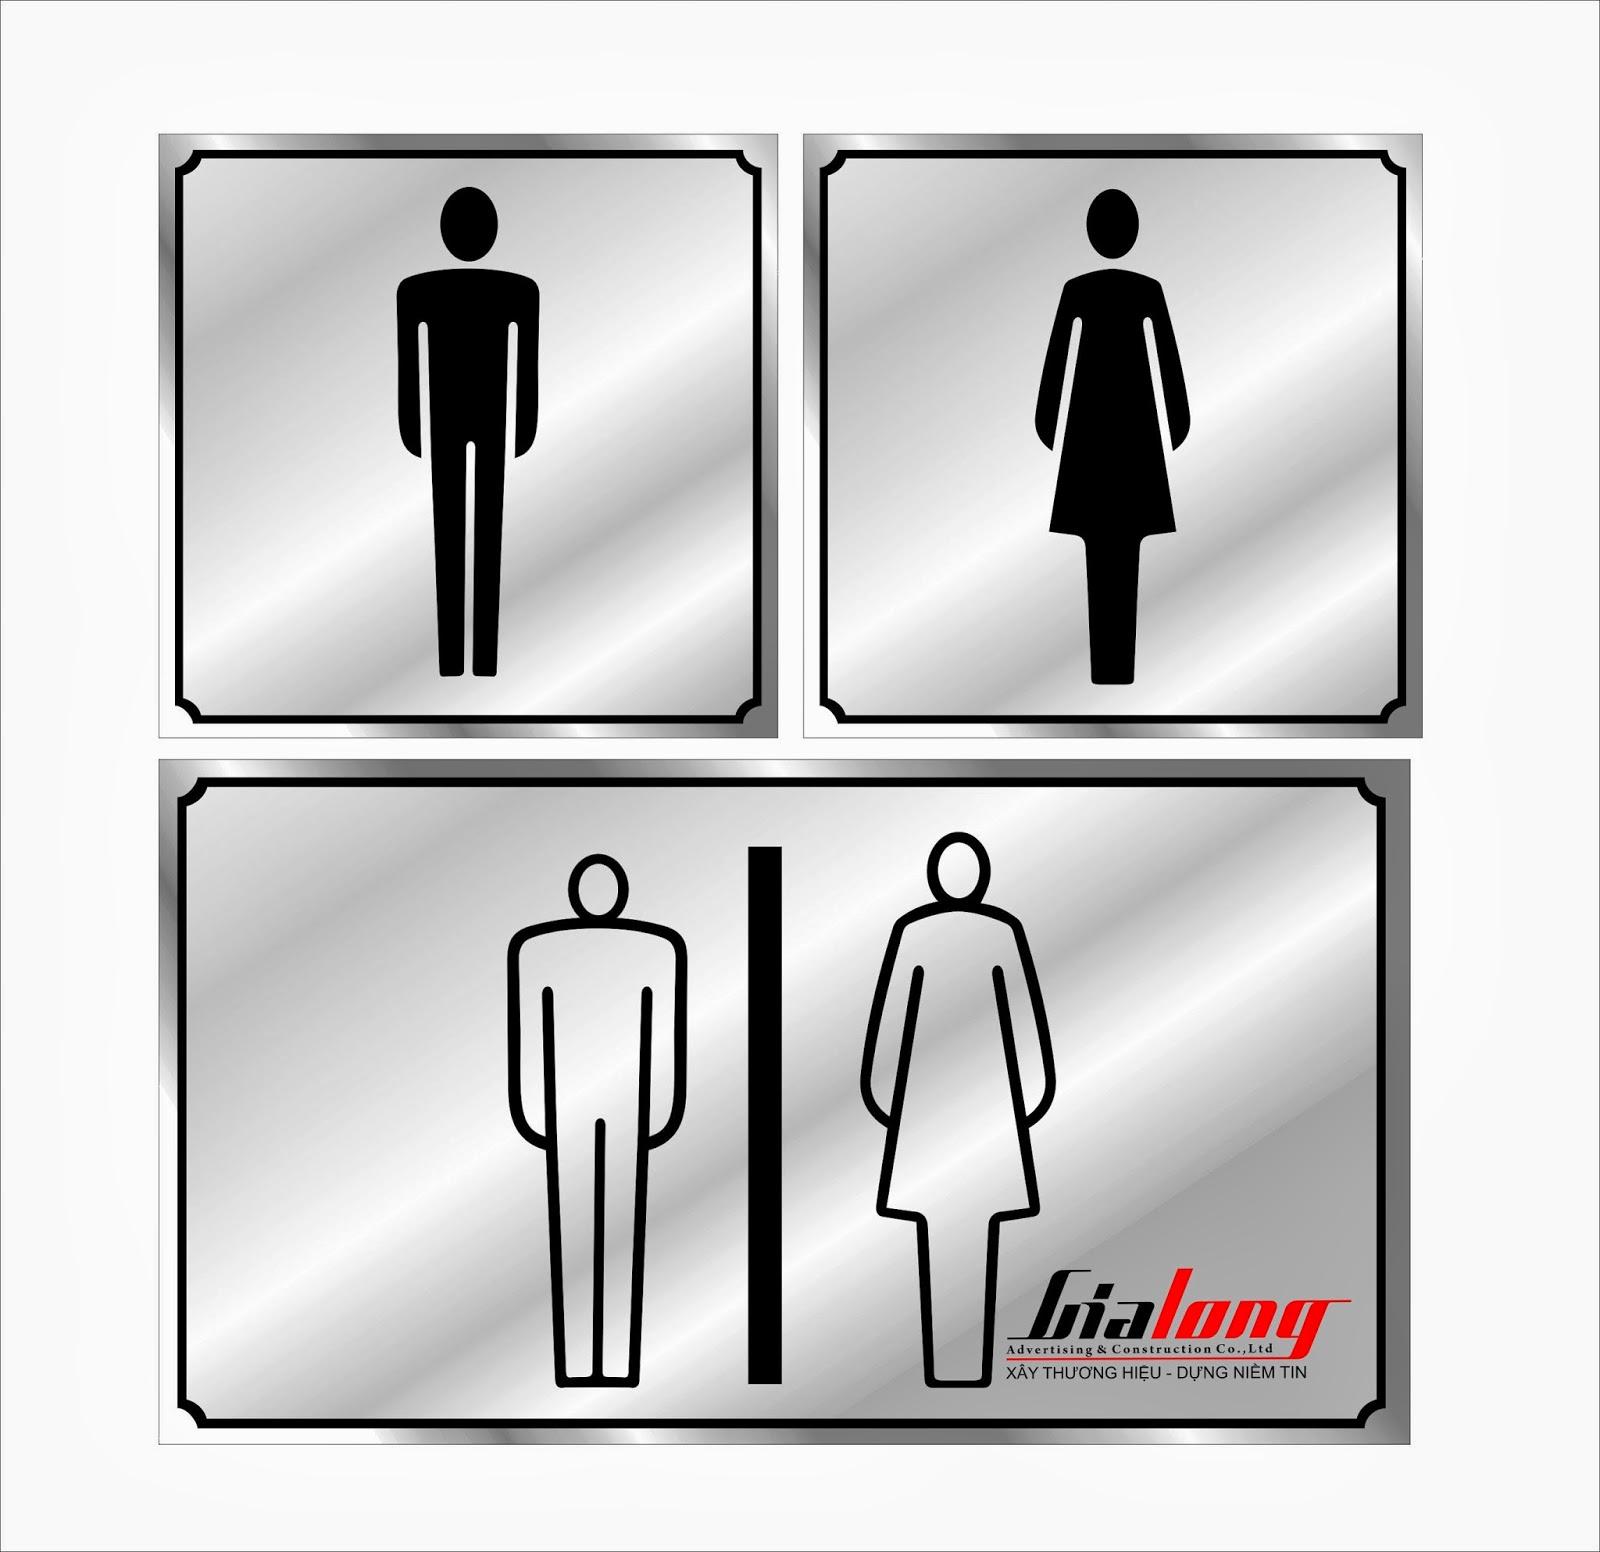 toilet+symbol,+b%E1%BA%A3ng+hi%E1%BB%87u+toalet,+logo+toa+let,+bi%E1%BB%83u+t%C6%B0%E1%BB%A3ng+nh%C3%A0+v%E1%BB%87+sinh.jpg